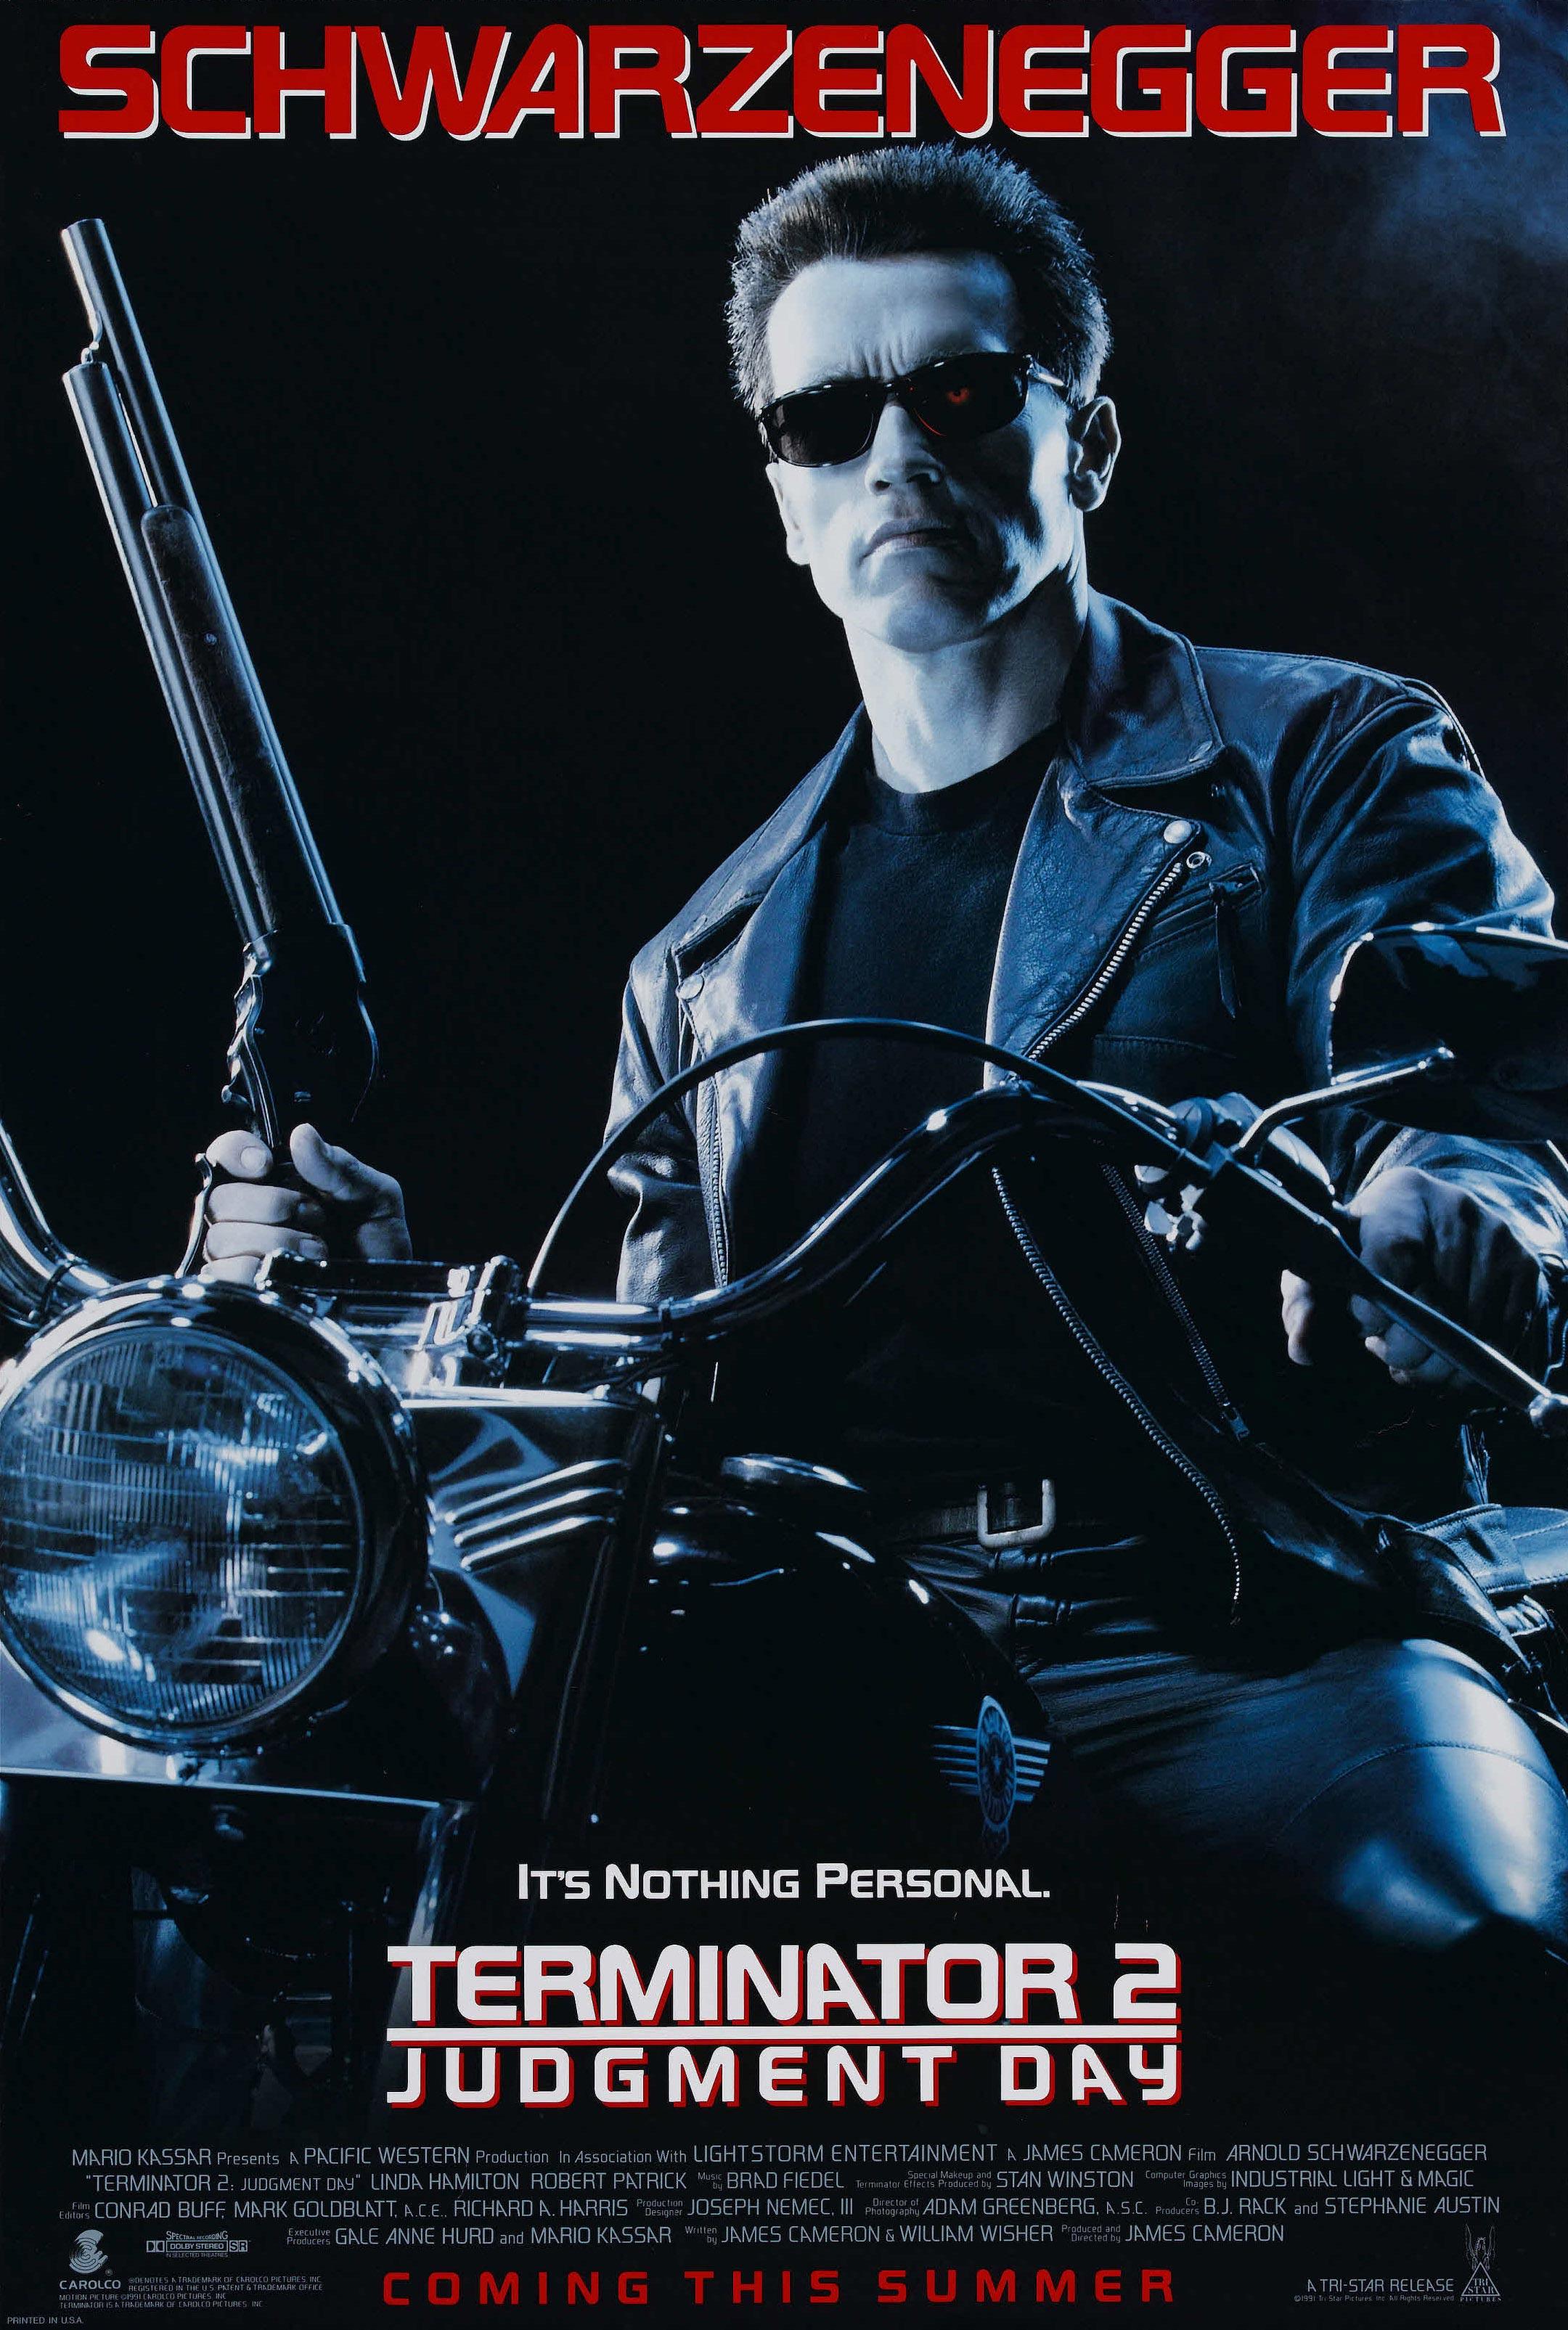 b1e3cf03 terminator 2 one sheet high resolution Terminator 2: Judgment Day Turns 25:  Better than